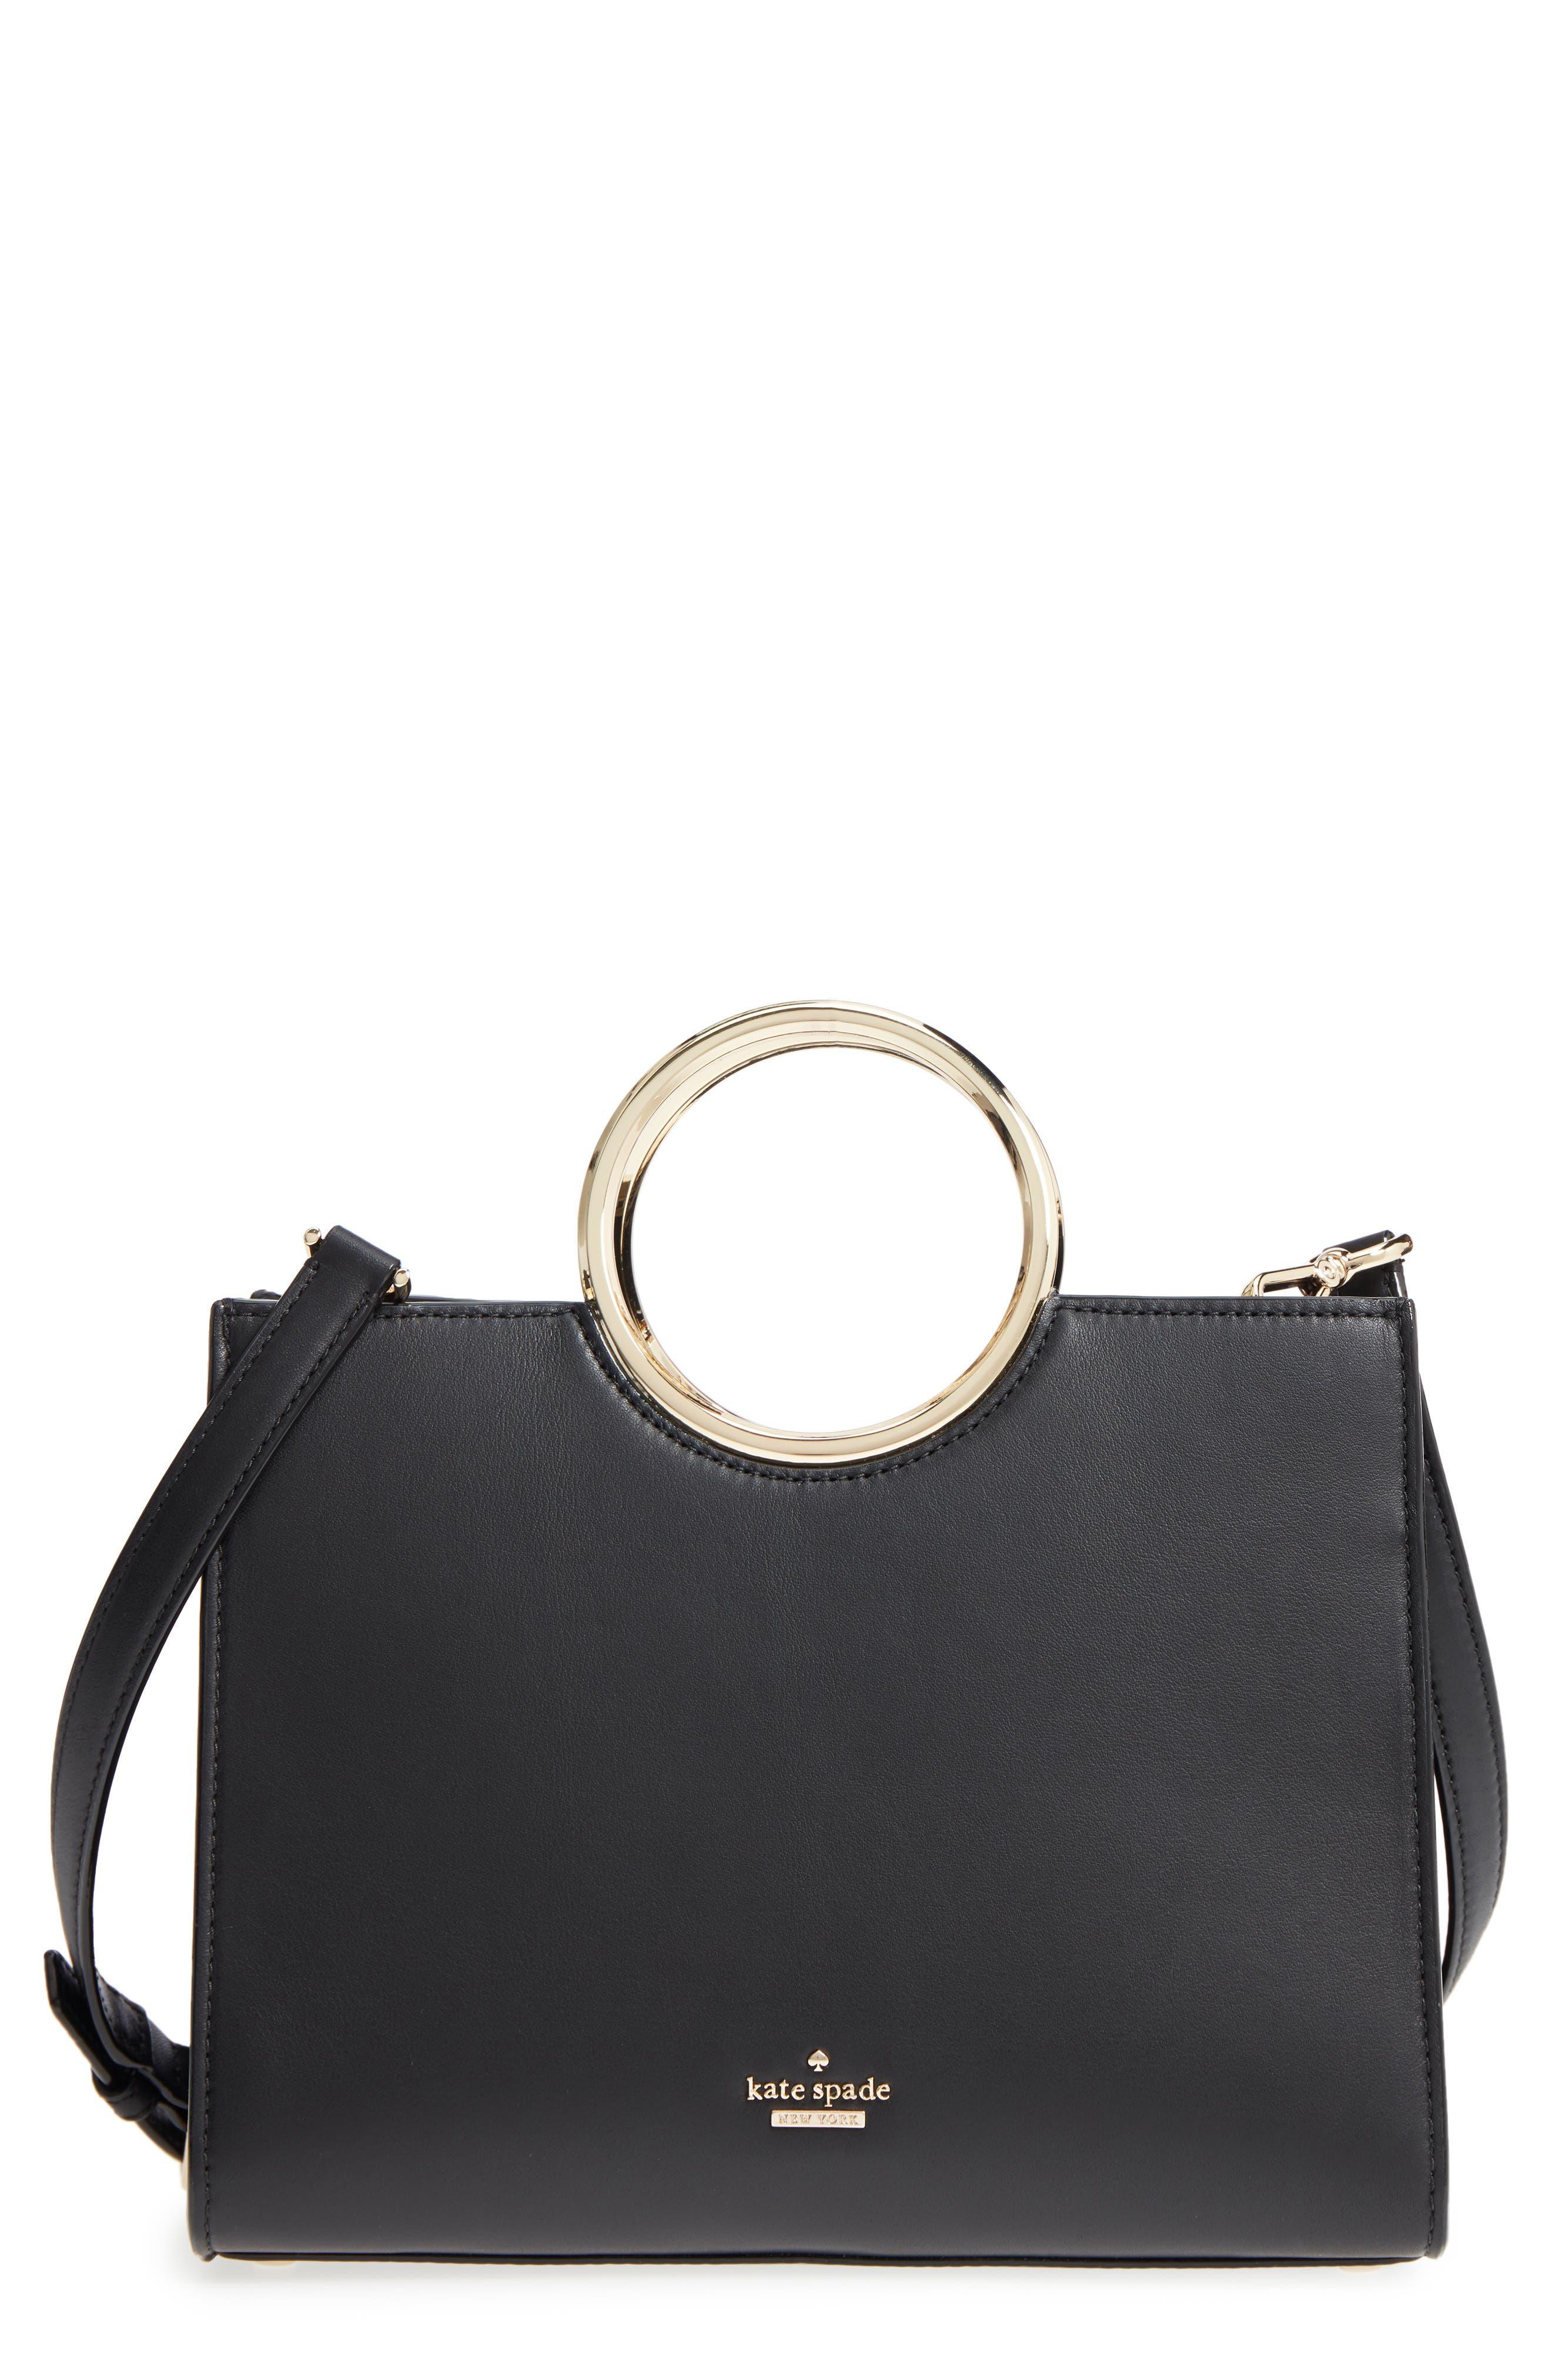 KATE SPADE NEW YORK,                             white rock road - sam leather satchel,                             Main thumbnail 1, color,                             001